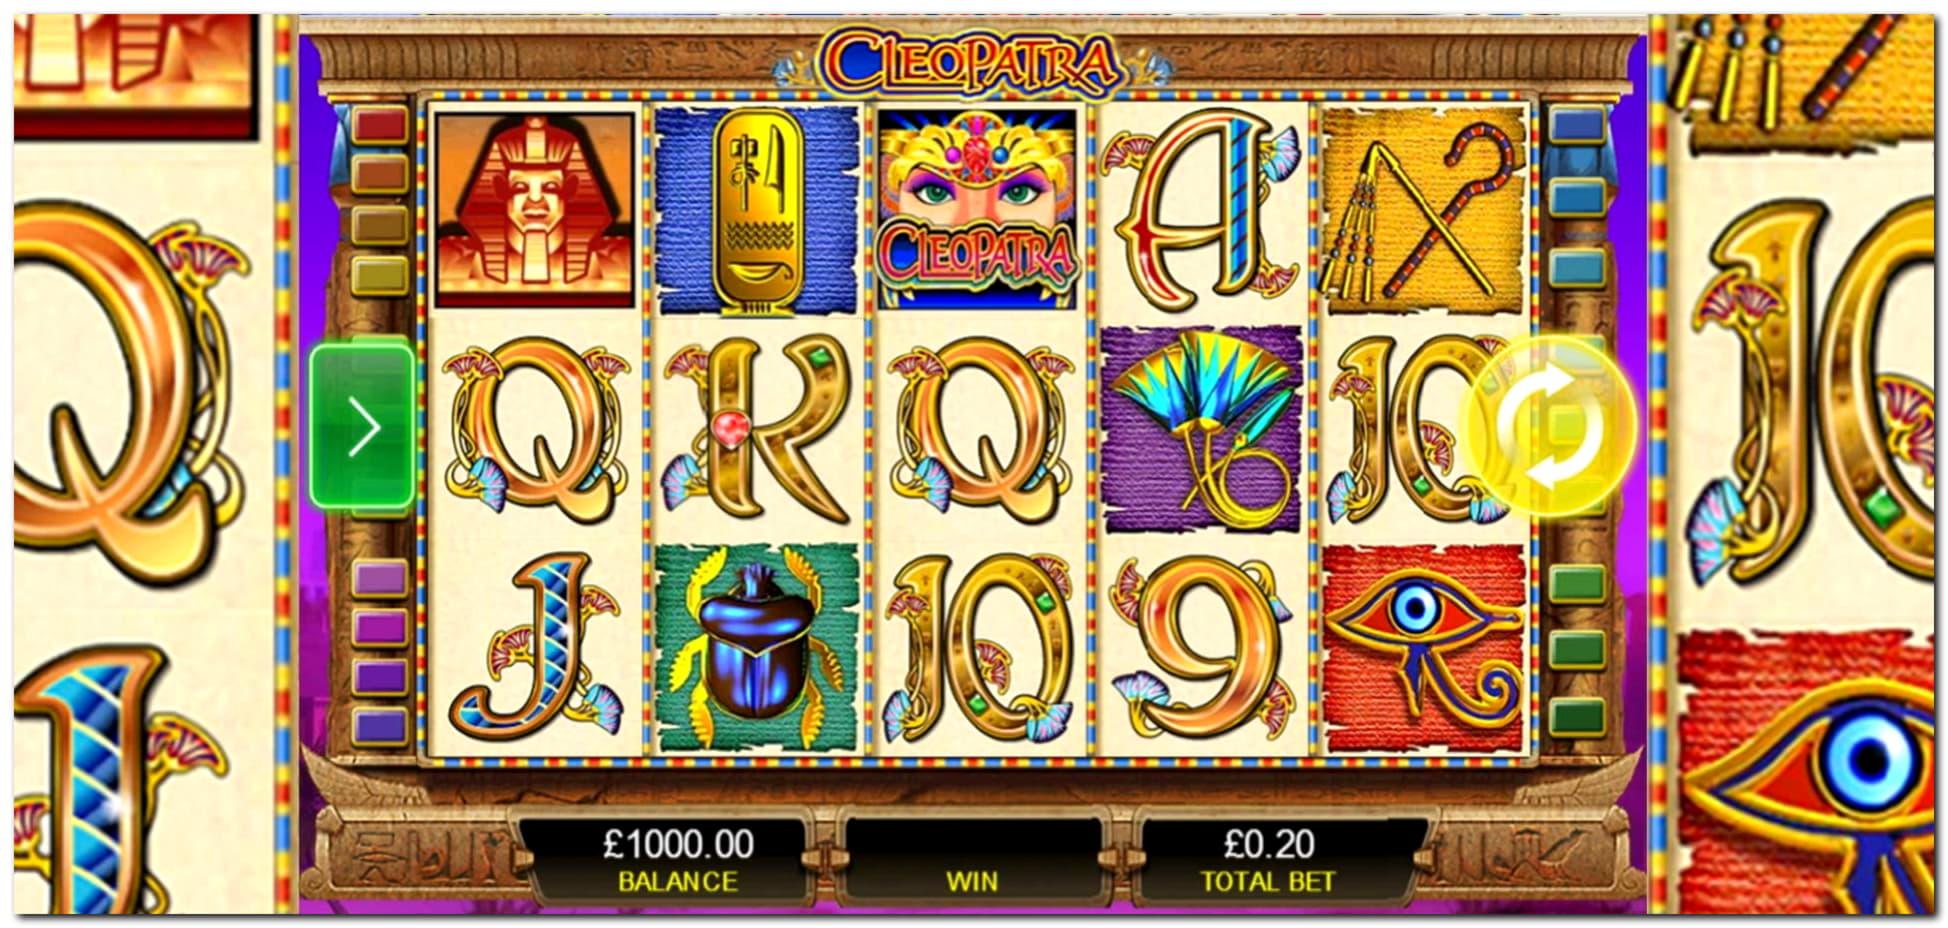 $1150 No deposit at Royal Dubai Casino